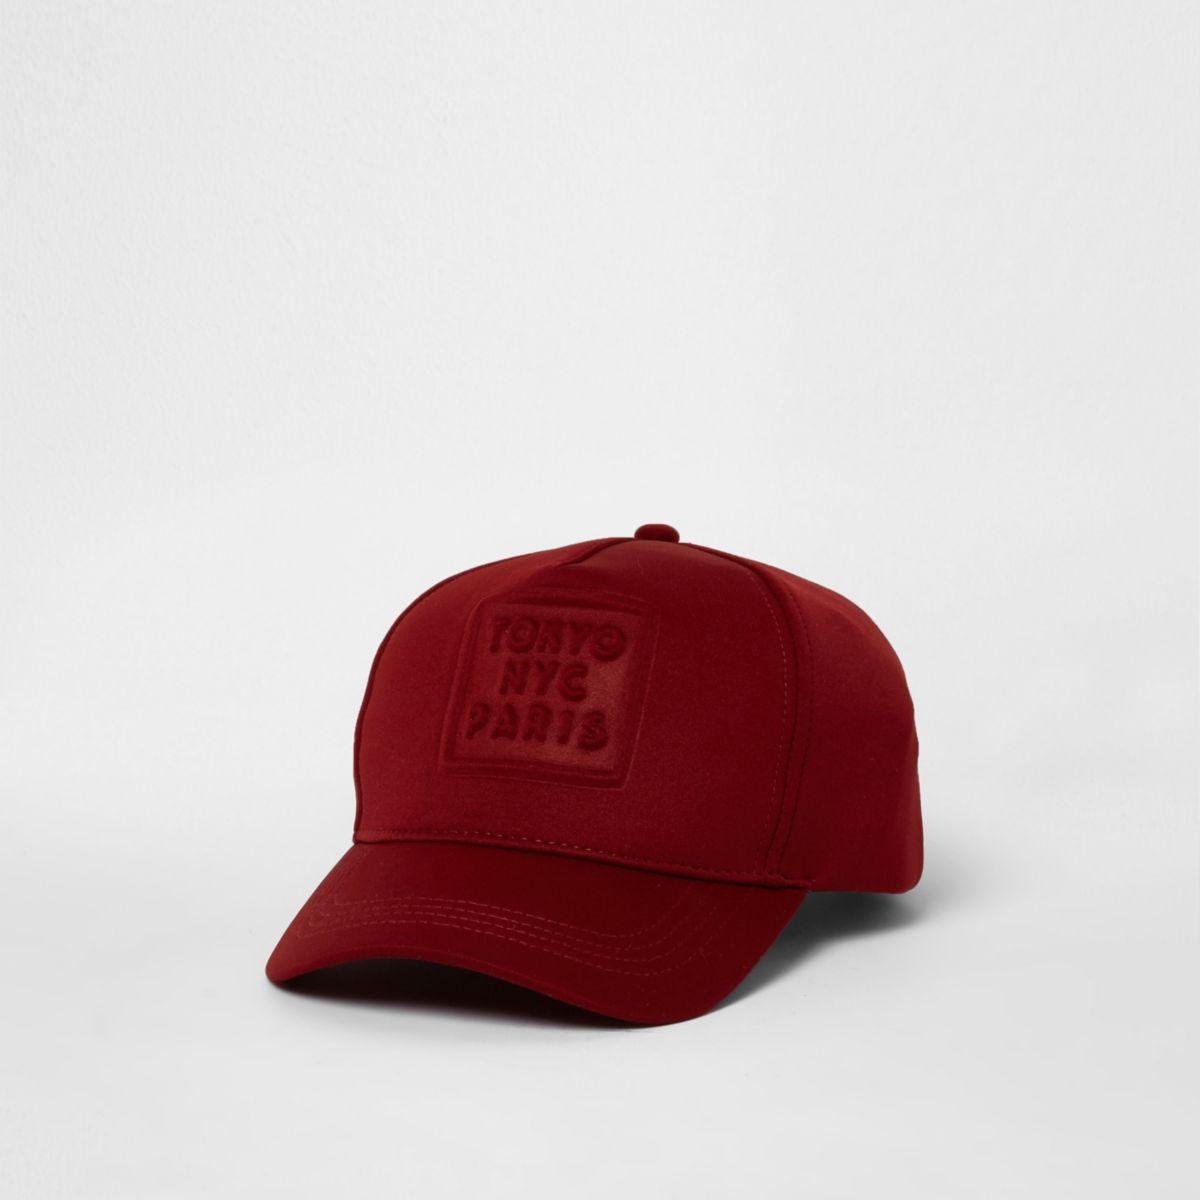 Burgundy 'NYC' embossed baseball cap